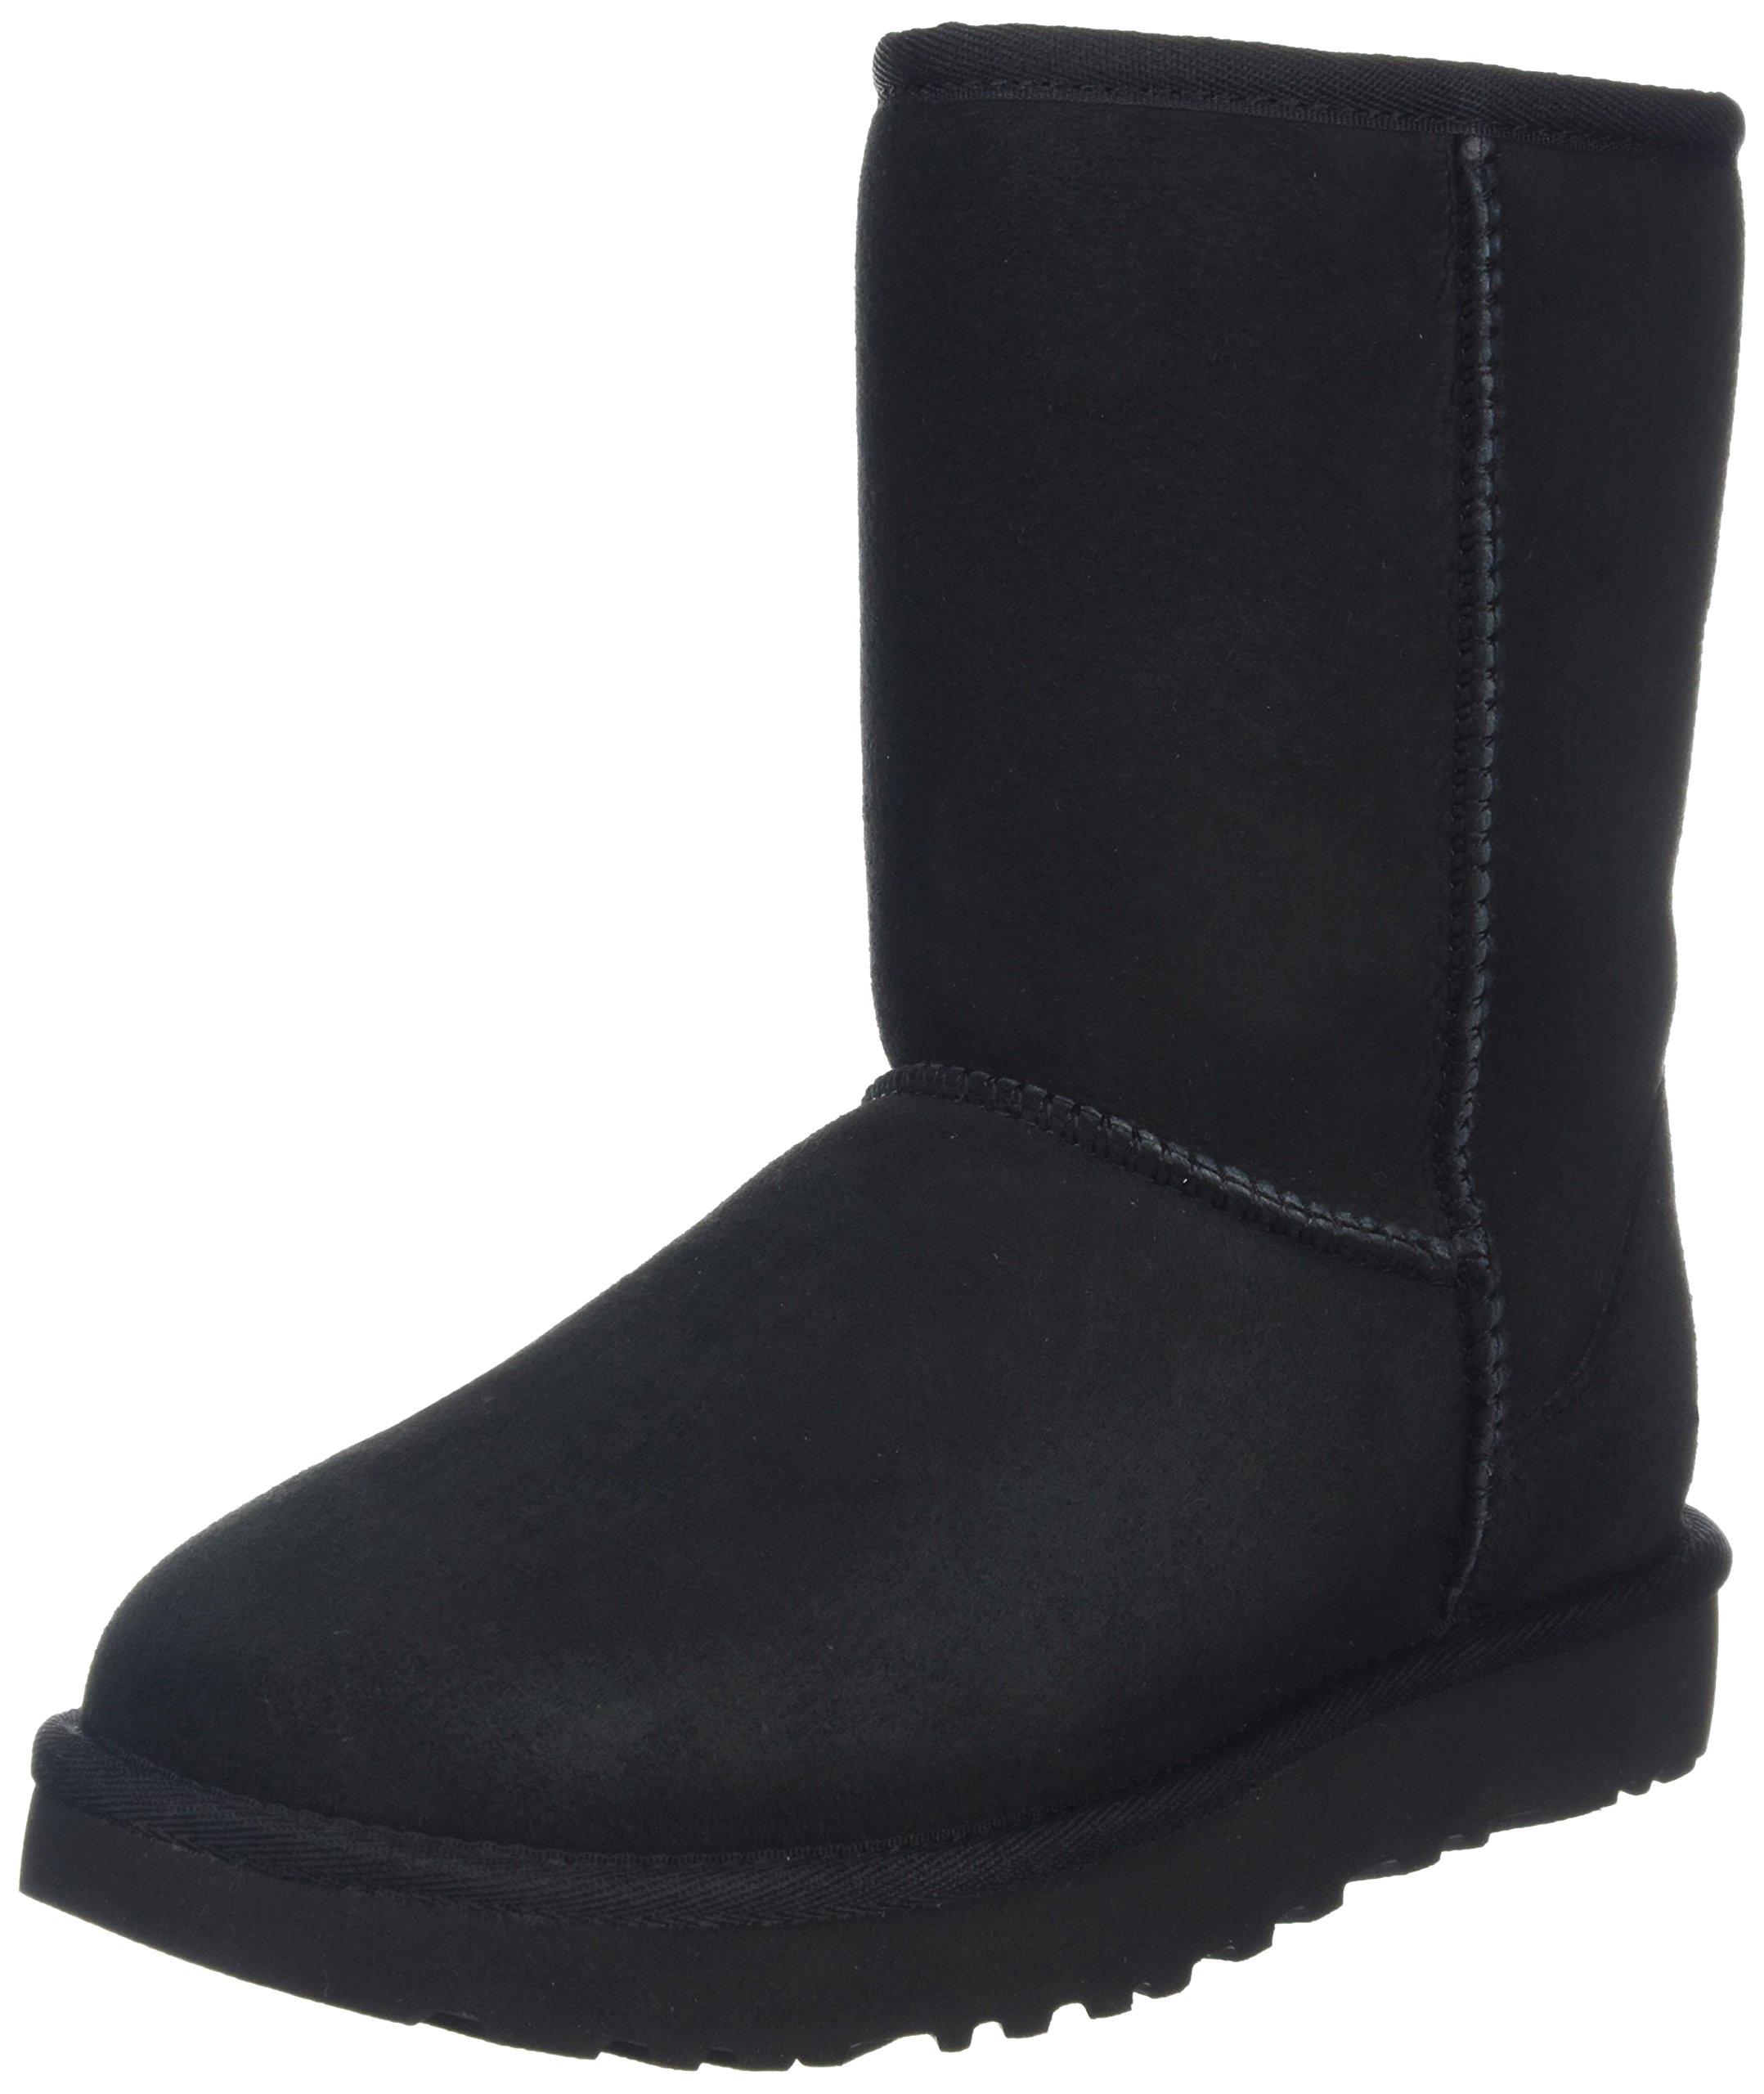 UGG Women's Classic Short II Winter Boot, Black, 8 B US by UGG